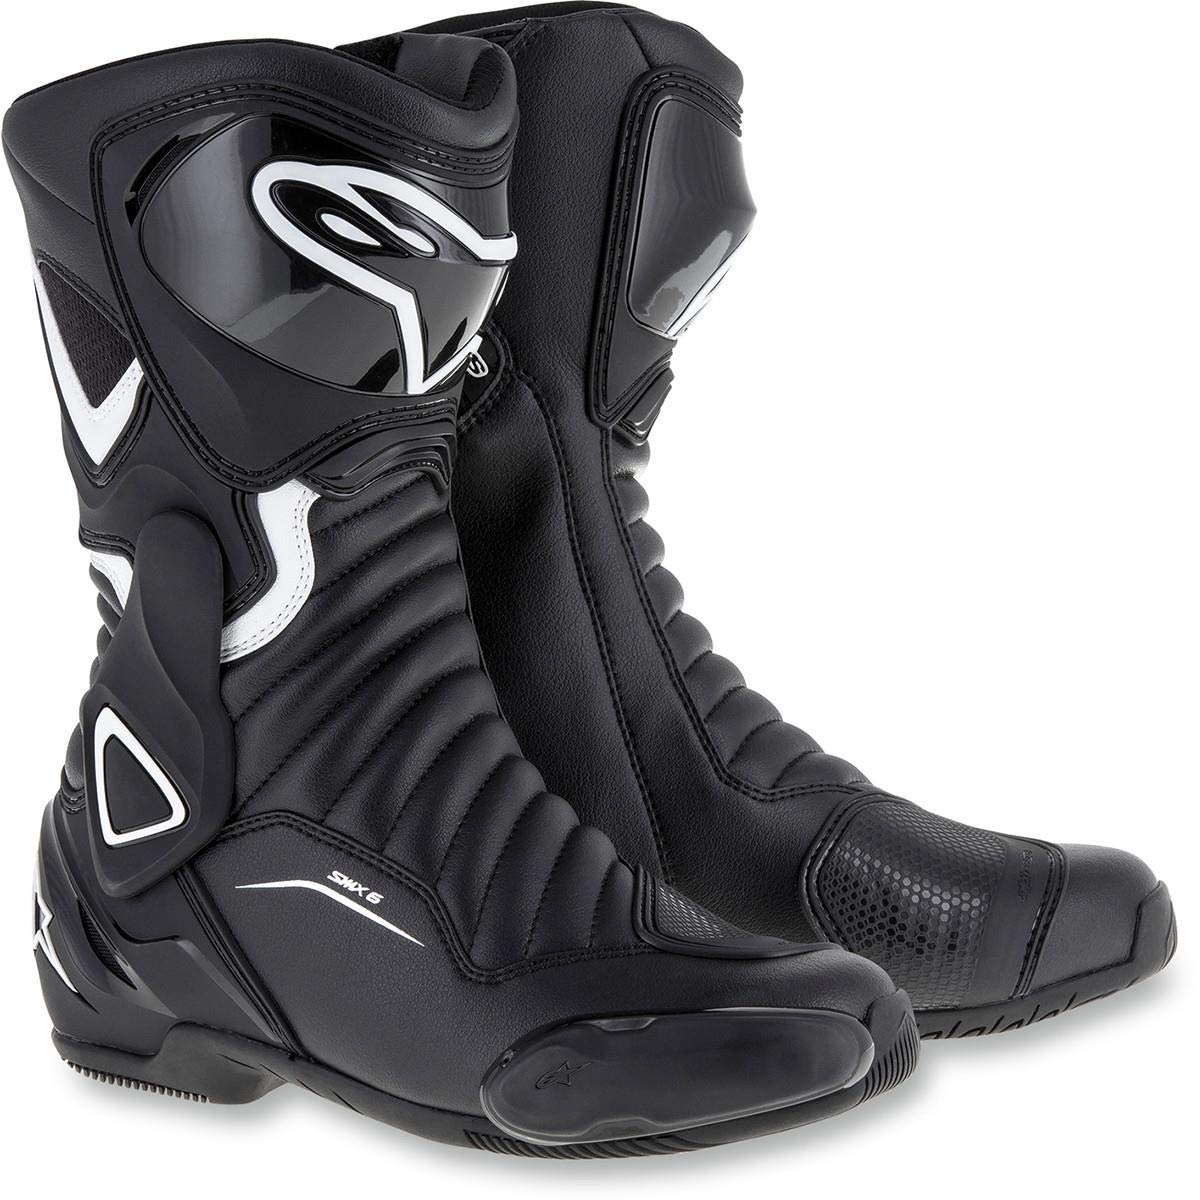 Noir//Blanc 37 Alpinestars 222311712-37 Chaussures Moto